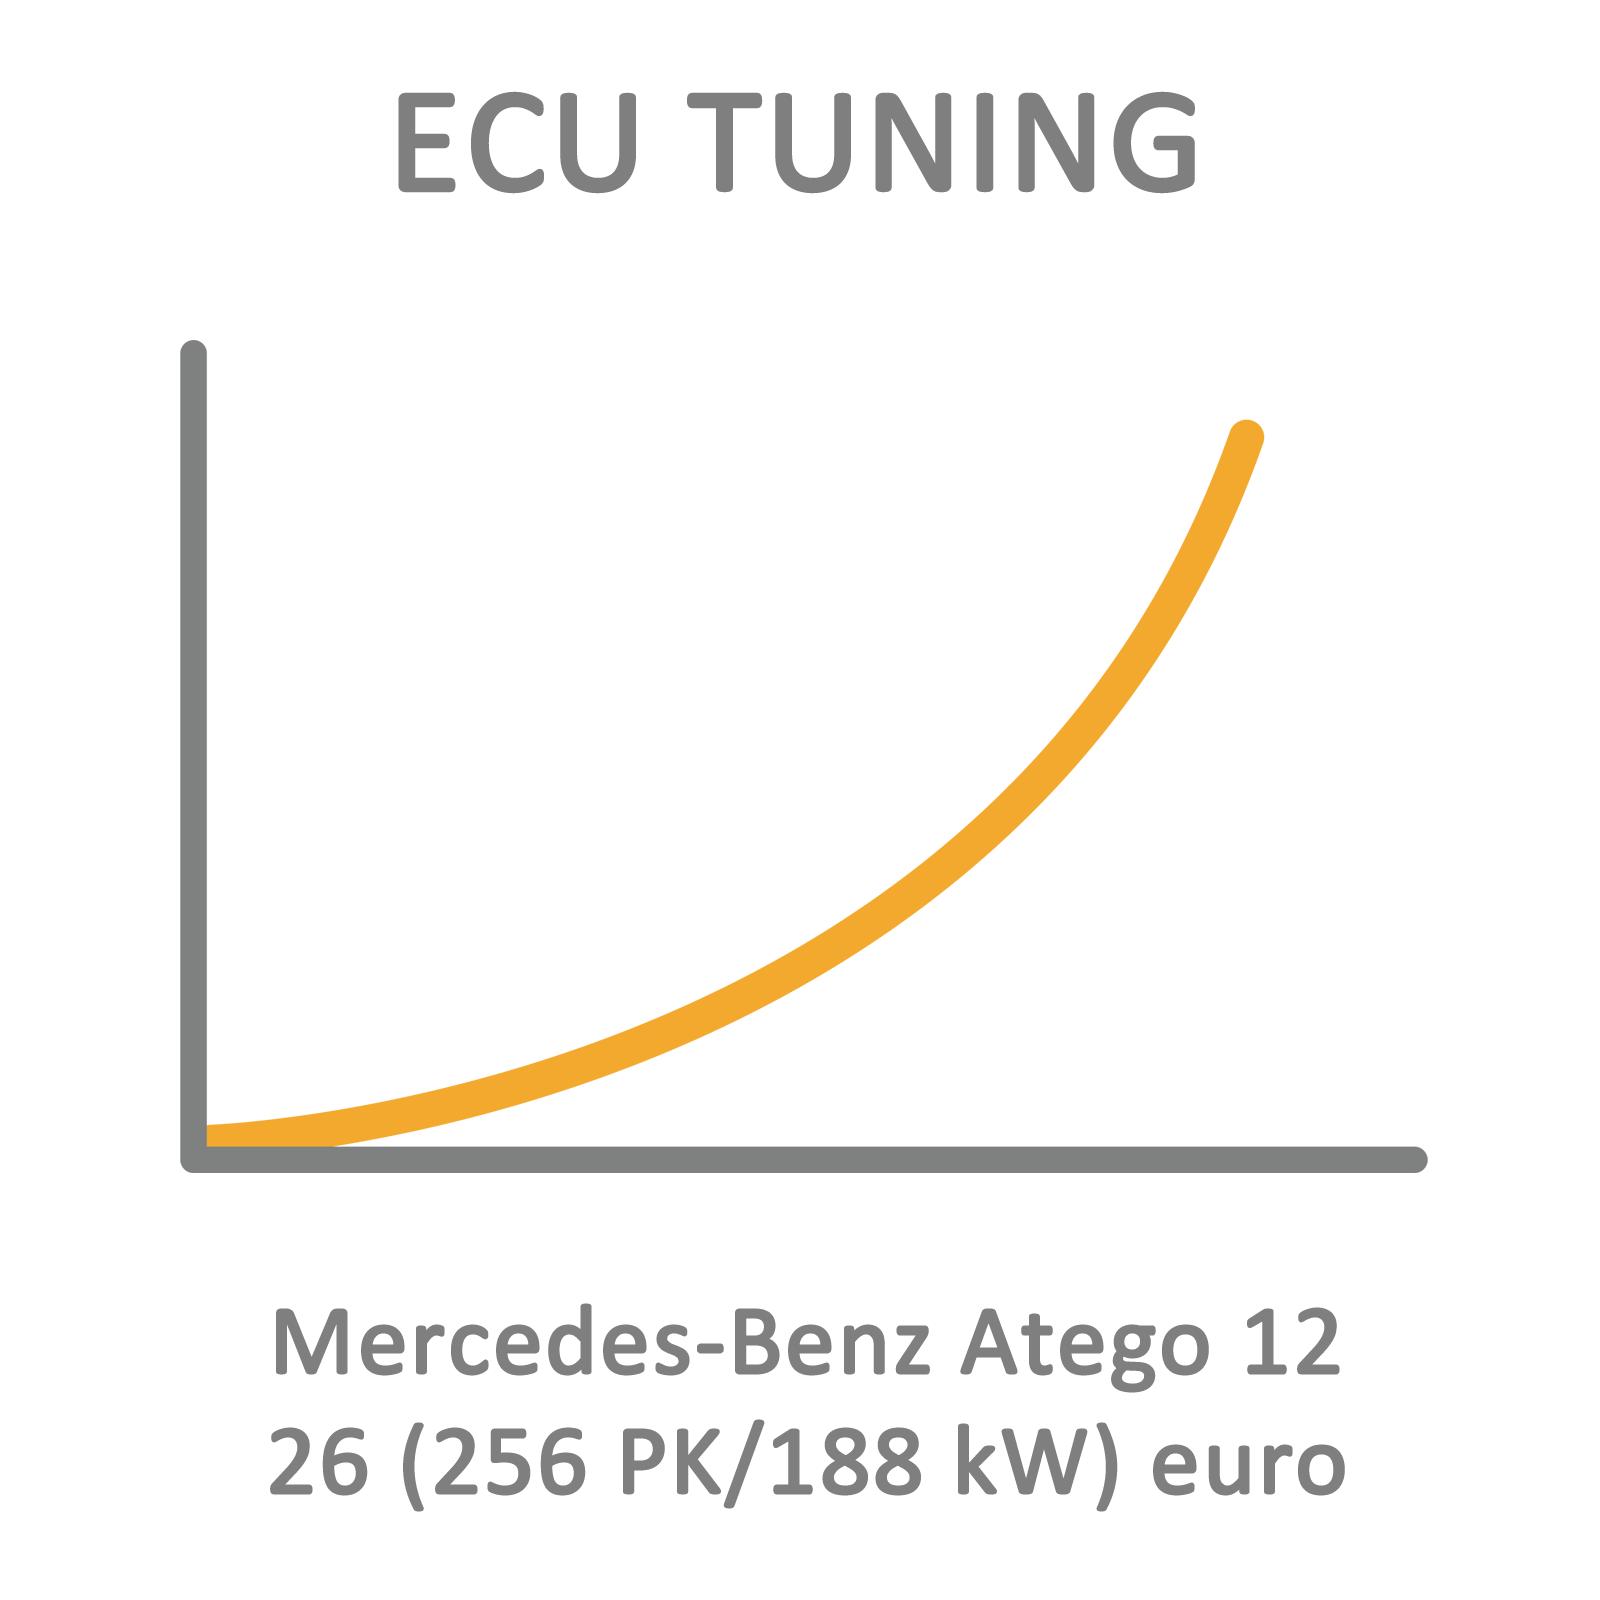 Mercedes-Benz Atego 12 26 (256 PK/188 kW) euro 4+5 ECU